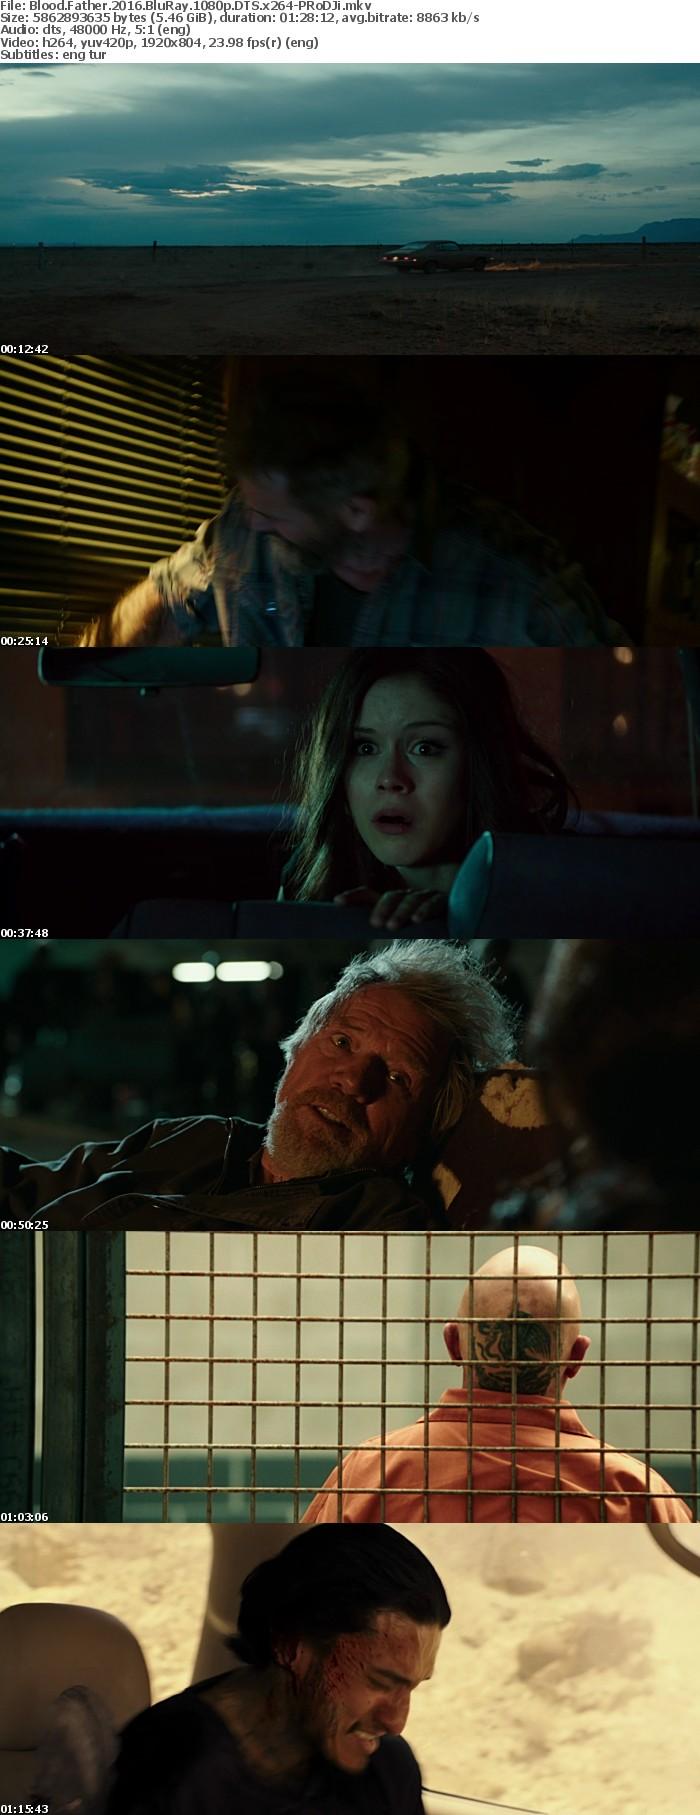 Blood Father 2016 BluRay 1080p DTS x264-PRoDJi